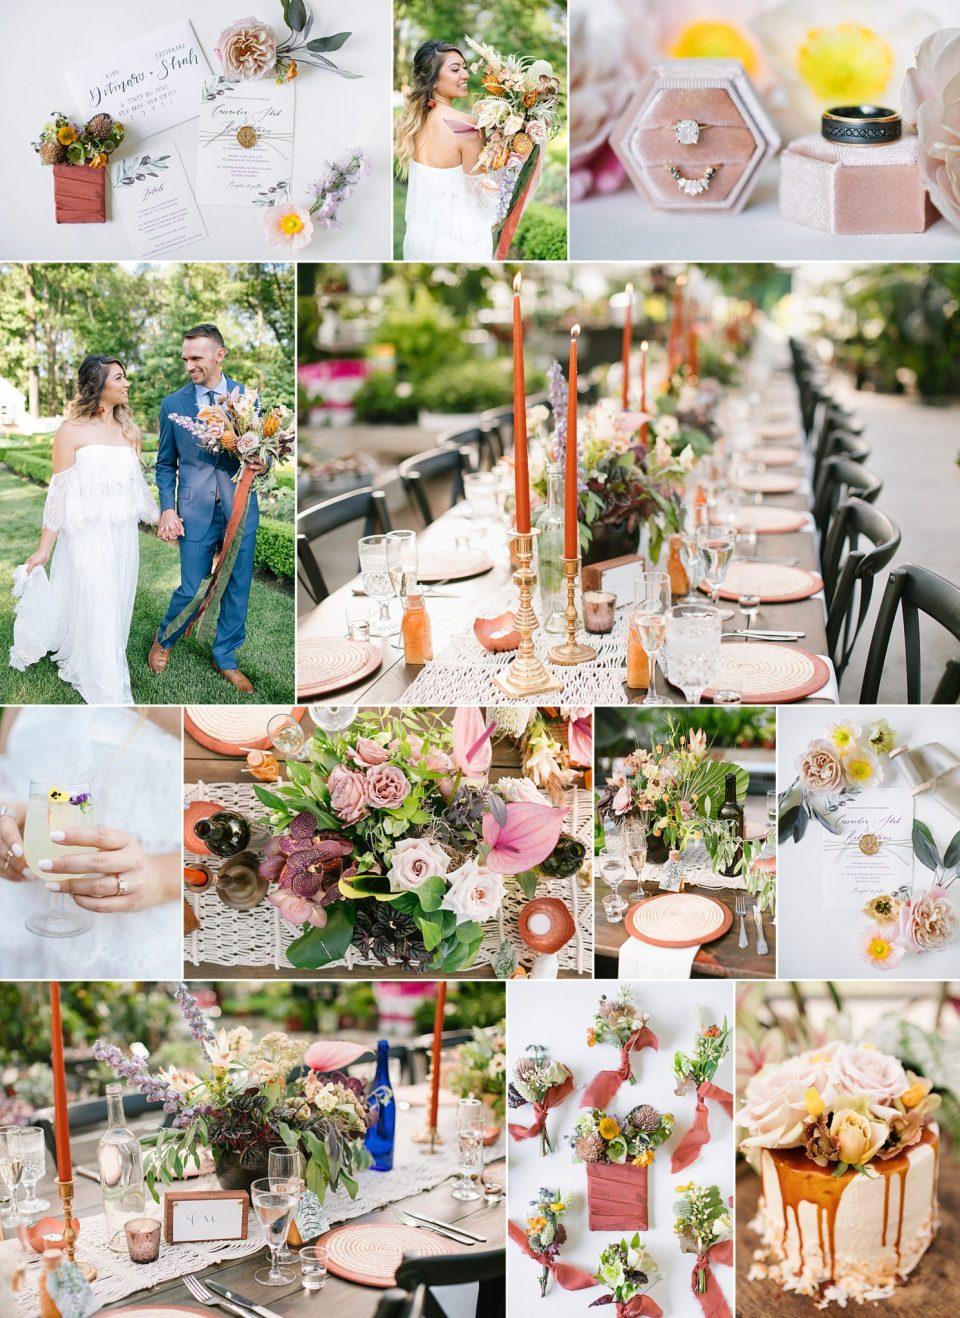 Ashley Mac Photographs | The Herbary Bear Creek Farm Wedding | Howell NJ wedding day | Howell NJ wedding photographer, NJ wedding photographer, New Jersey wedding photographer, boho wedding inspiration, summer wedding inspiration